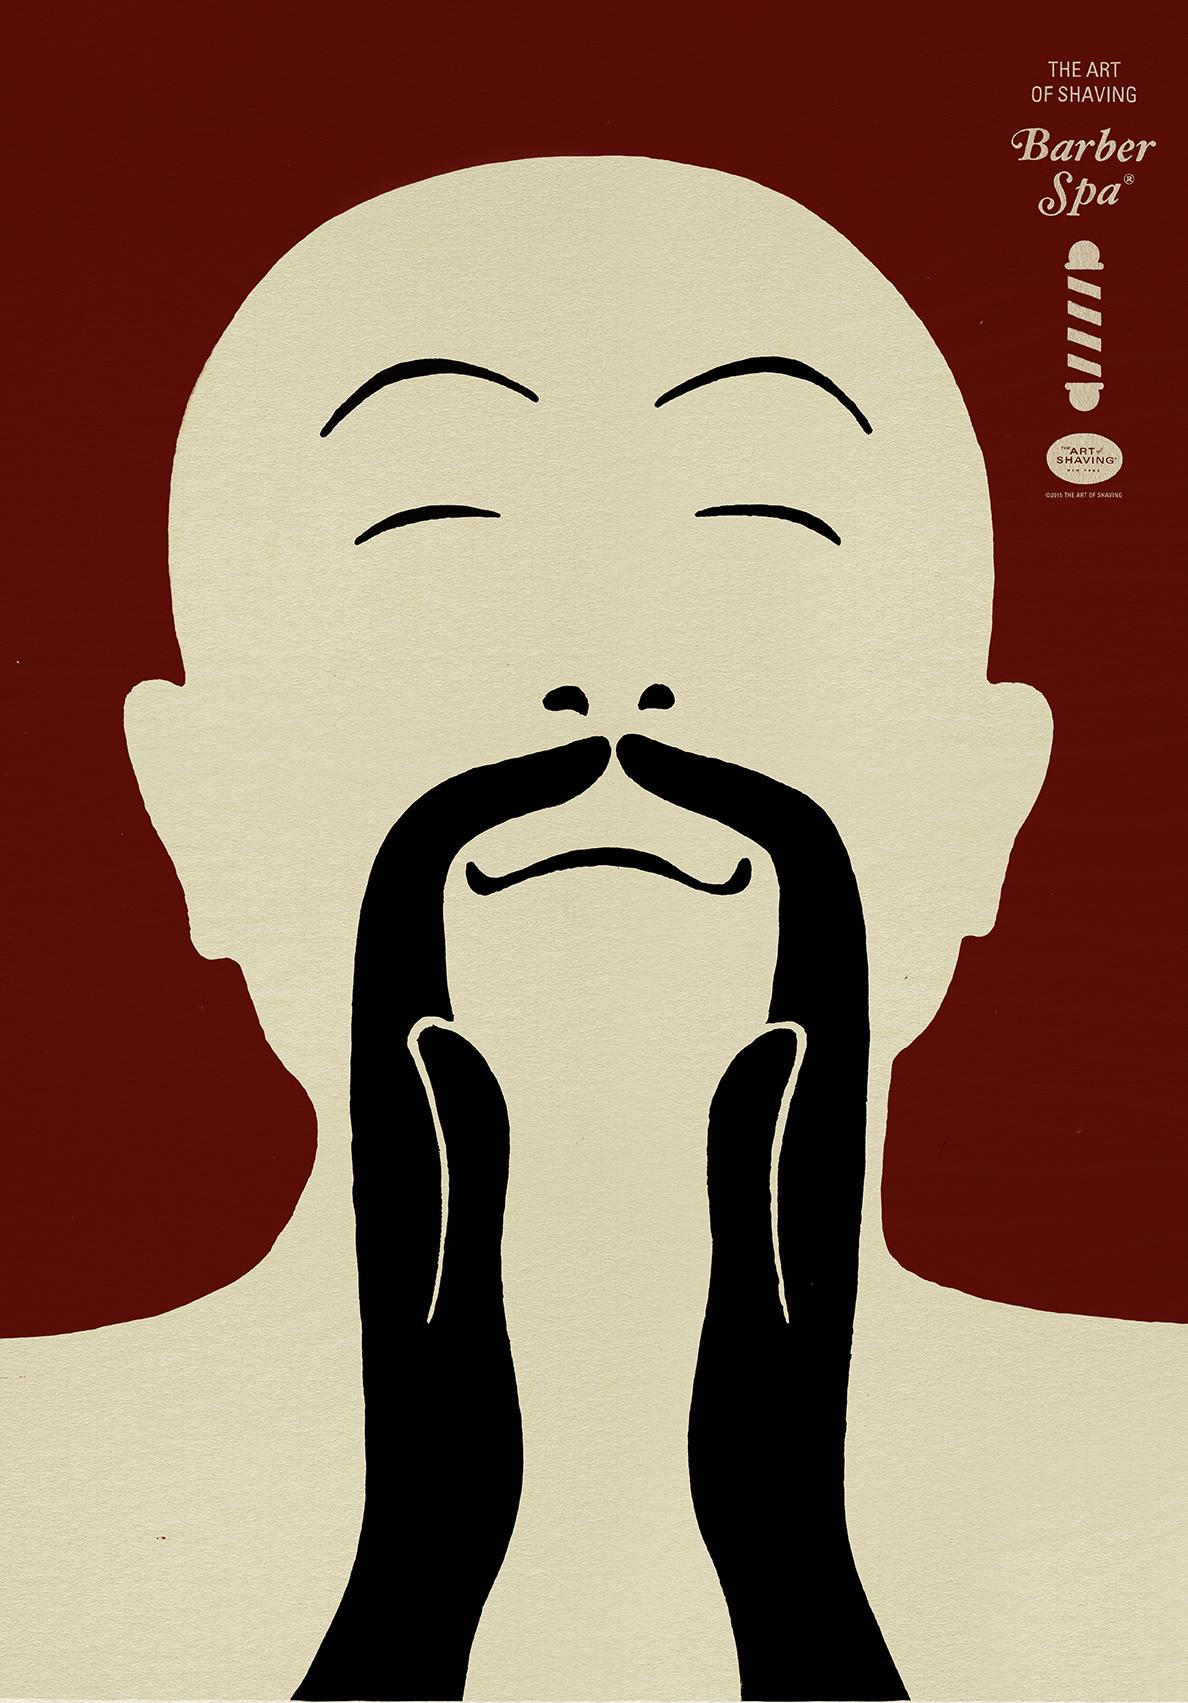 beard3ab_2.jpg